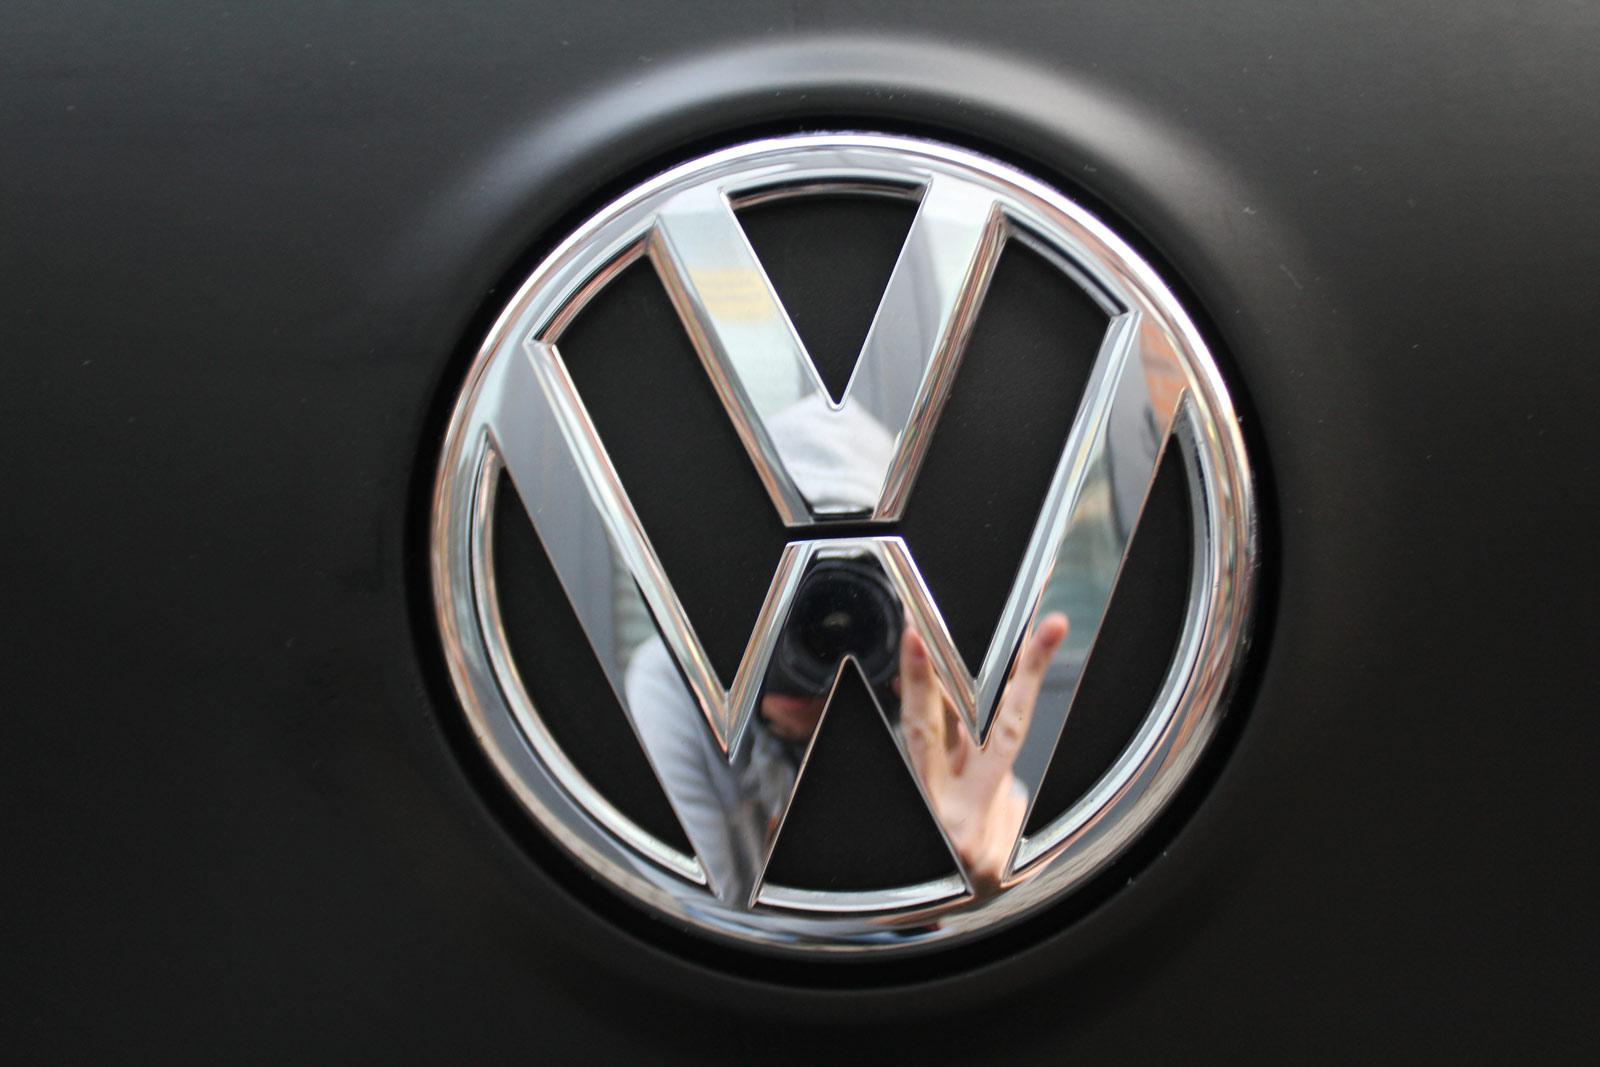 VW_GOLF_GTI_SCHWARZ_MATT_SCHEIBENTOENUNG_16